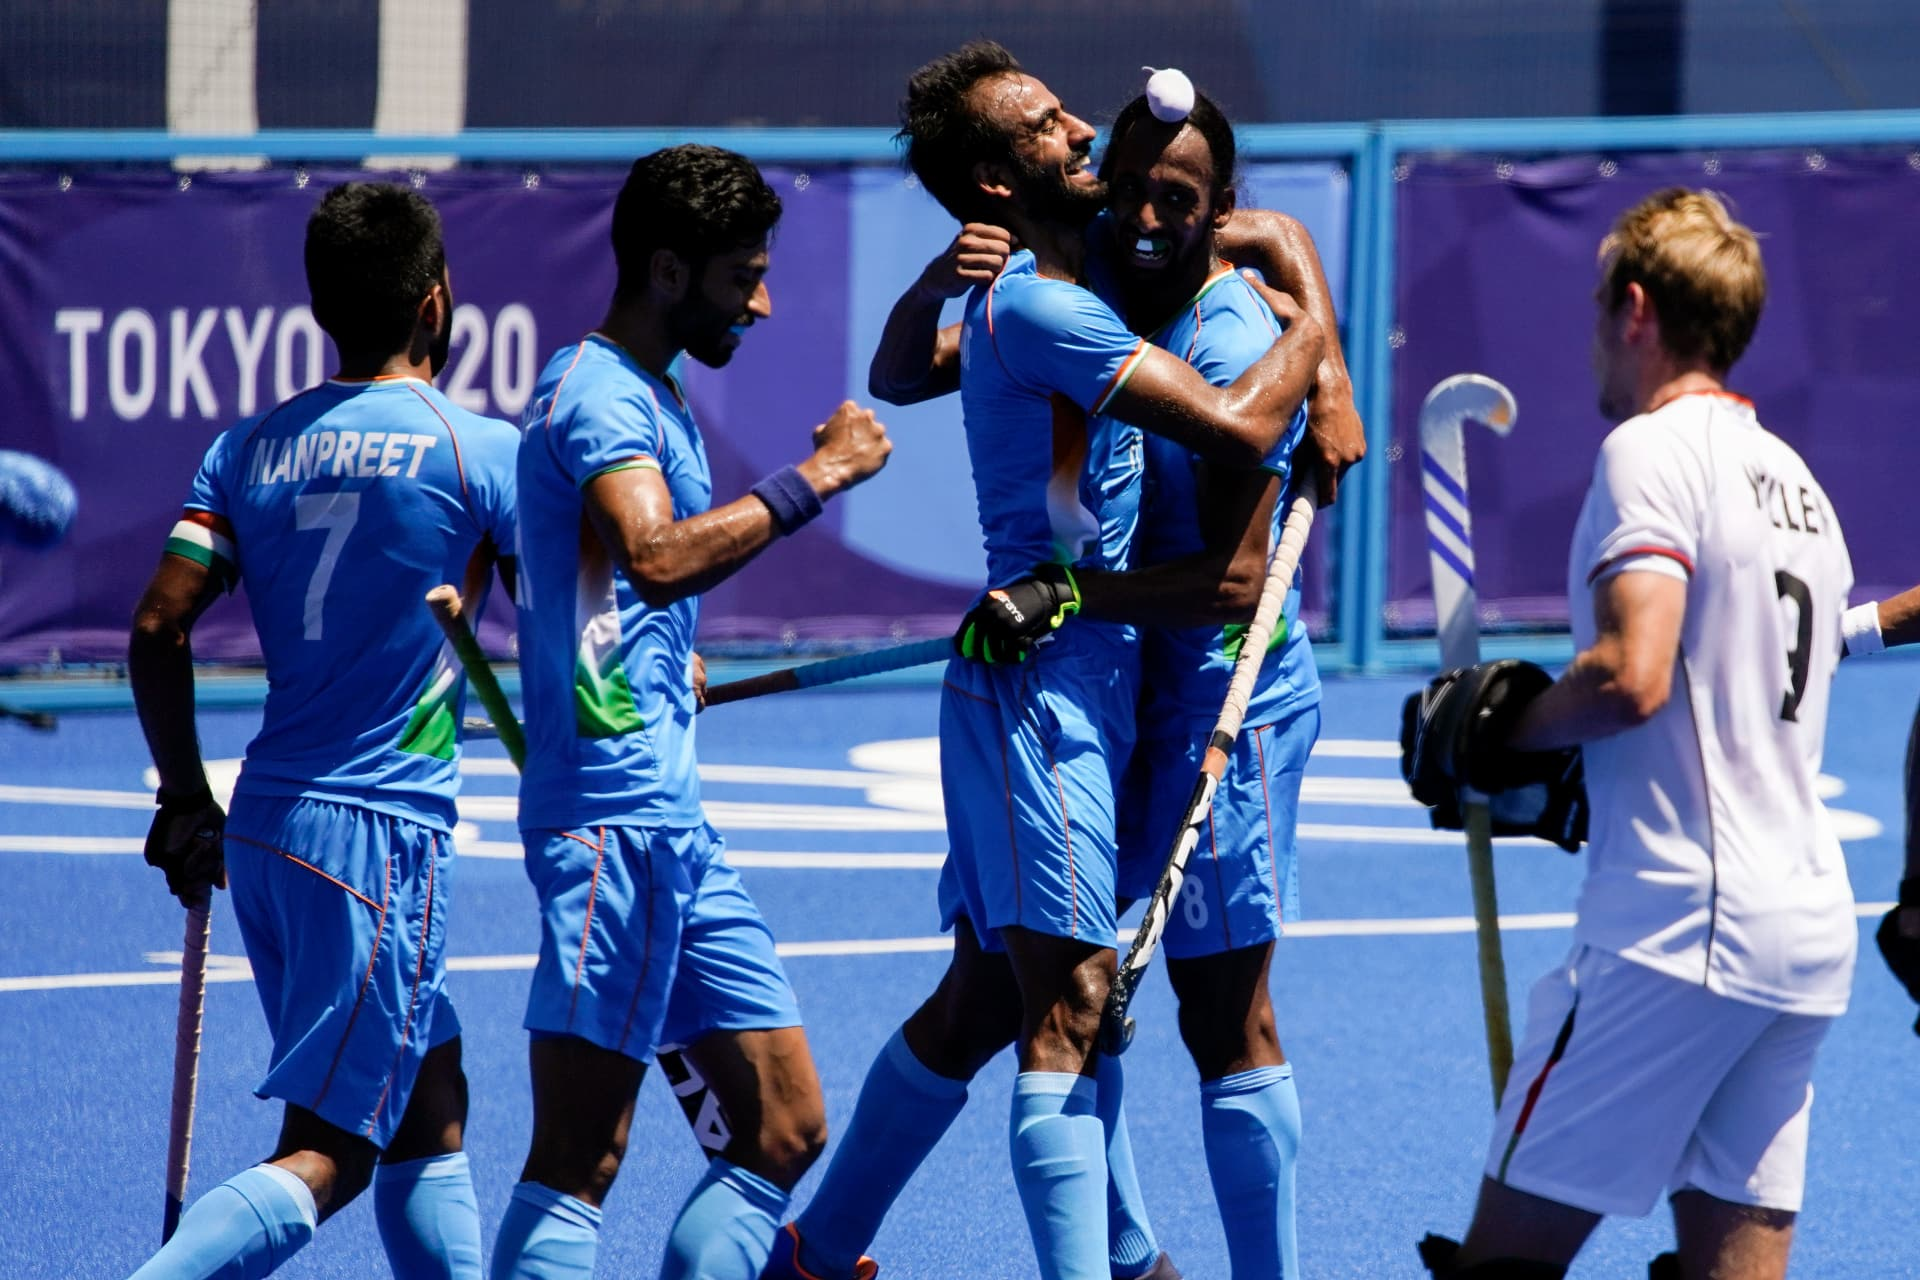 Tokyo Olympics 2020 Day 13 Highlights: Ravi Kumar Dahiya wins silver, India win historic bronze in Men's hockey